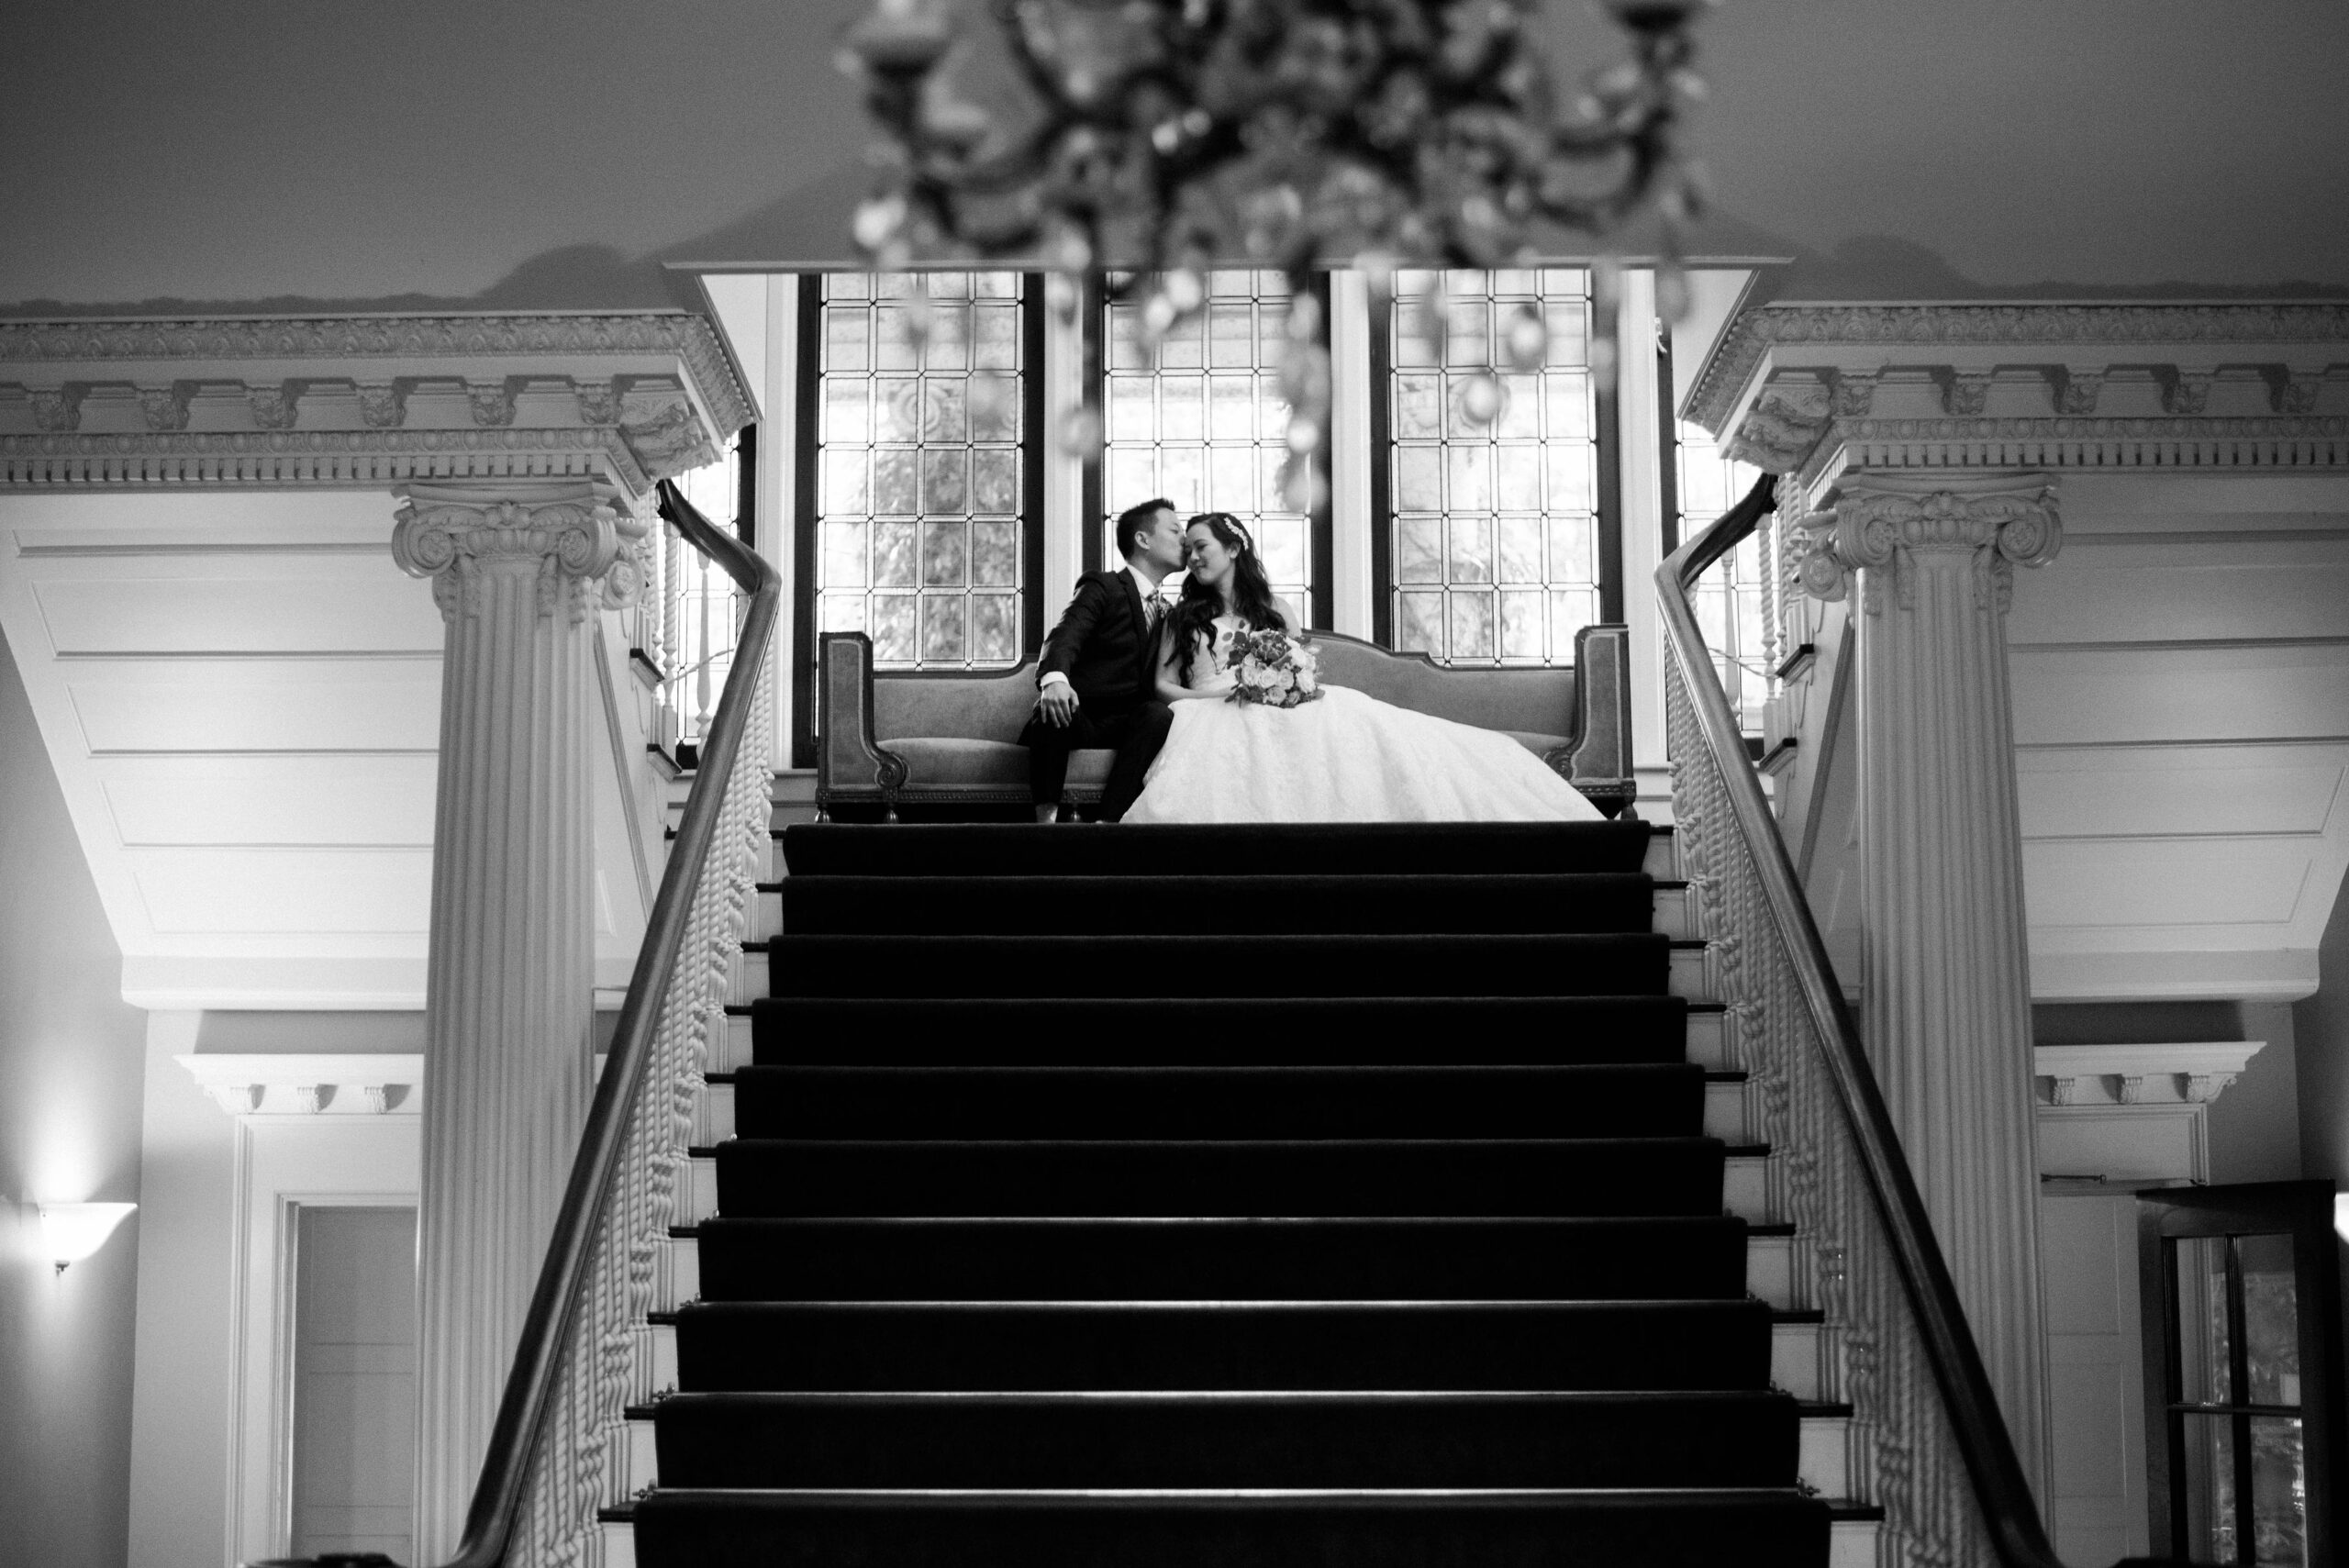 Hycroft Manor wedding in Vancouver